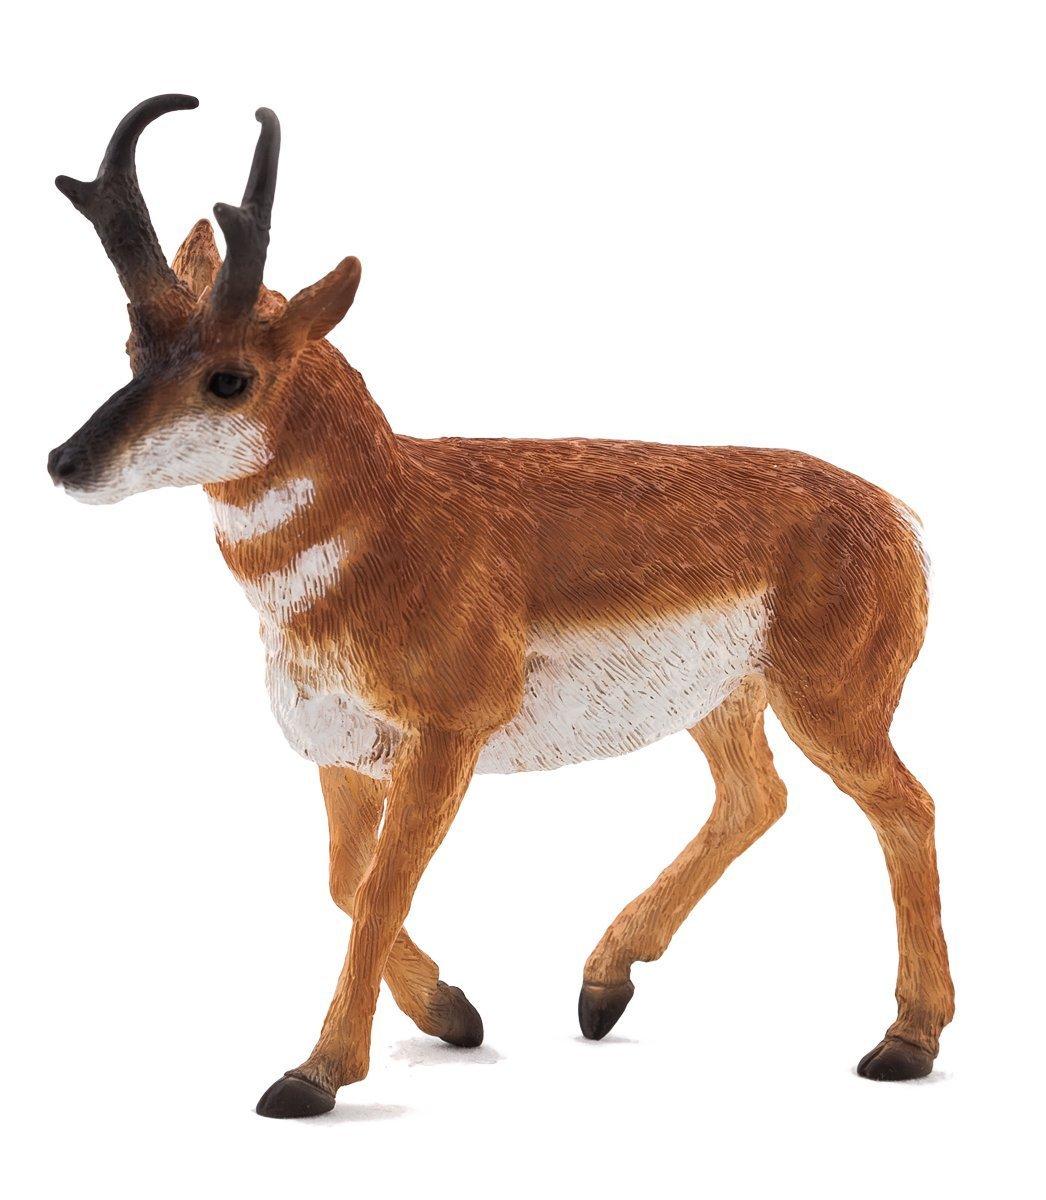 Фигурка - Антилопа вилорогая, размер 11 х 3 х 10,5 см.Дикая природа (Wildlife)<br>Фигурка - Антилопа вилорогая, размер 11 х 3 х 10,5 см.<br>